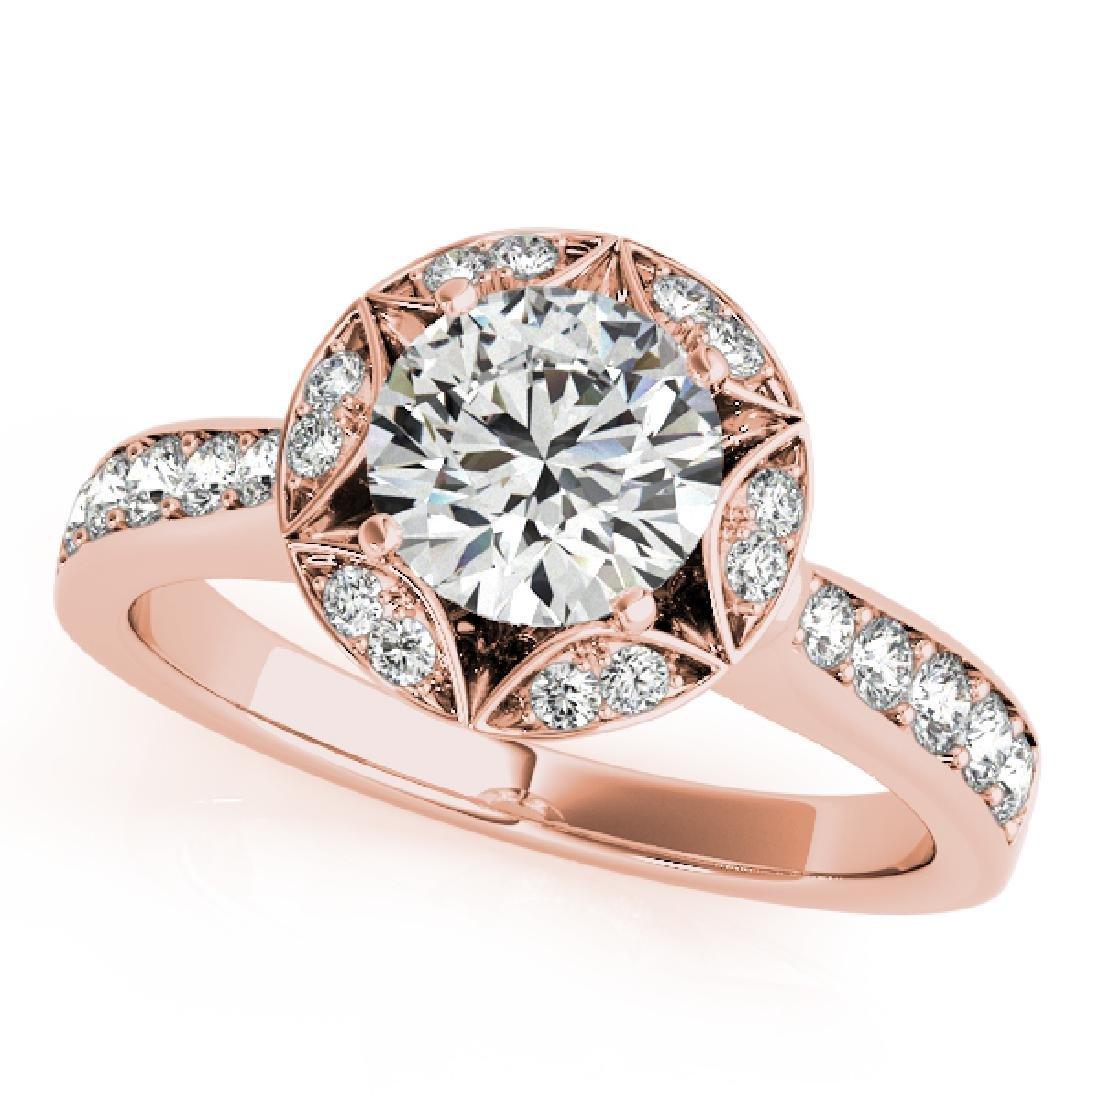 CERTIFIED 18K ROSE GOLD 1.30 CT G-H/VS-SI1 DIAMOND HALO